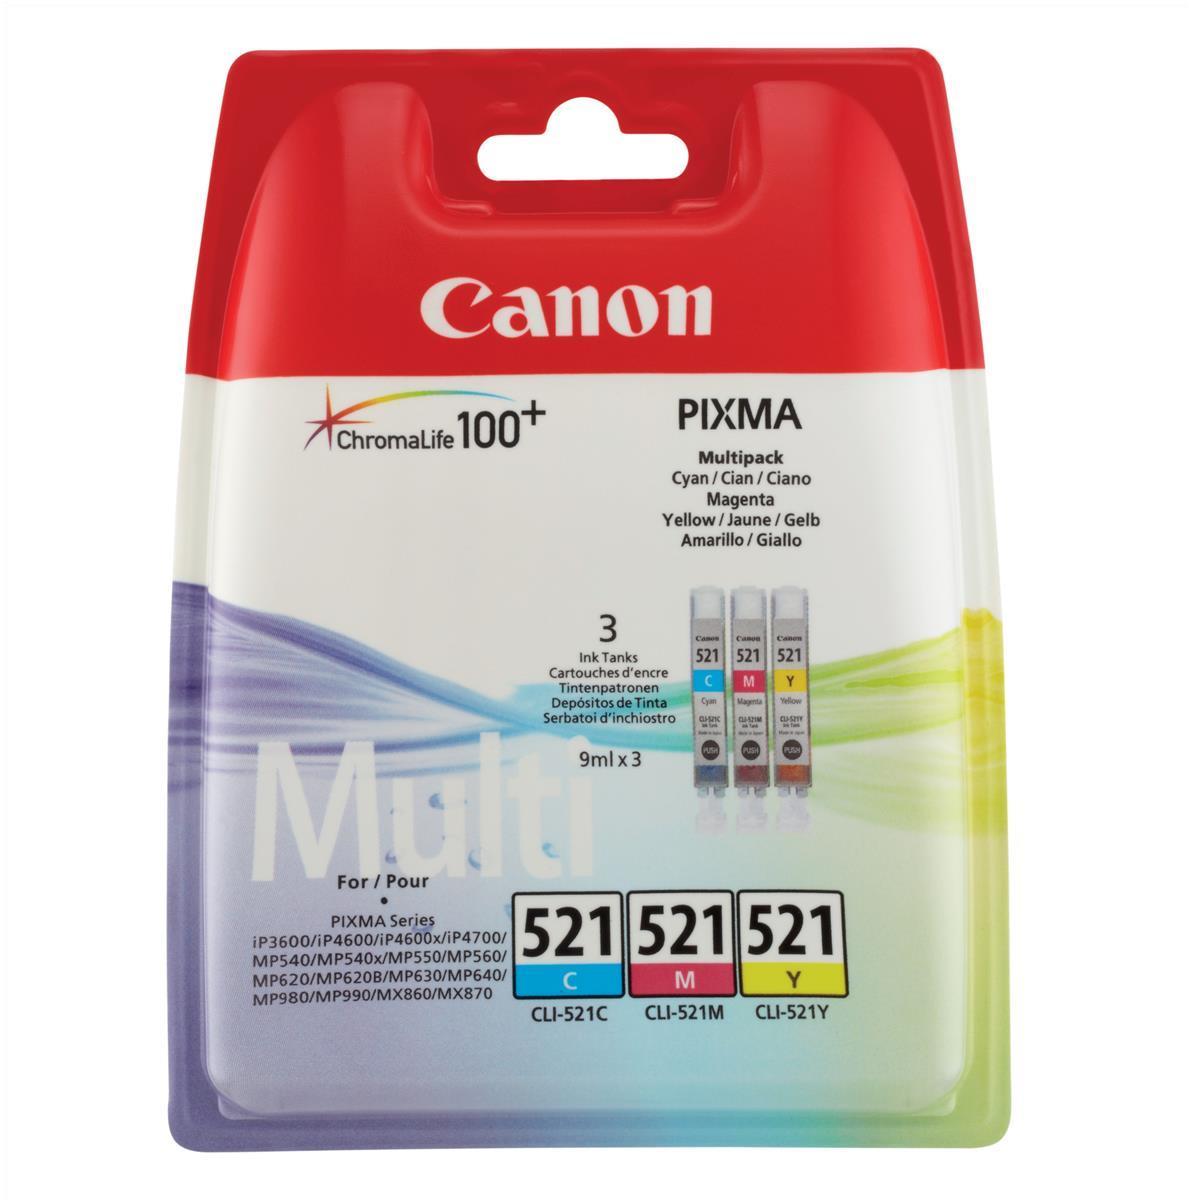 Canon CLI-521 Inkjet Cartridges Cyan/Magenta/Yellow Ref 2934B007 [Pack 3]